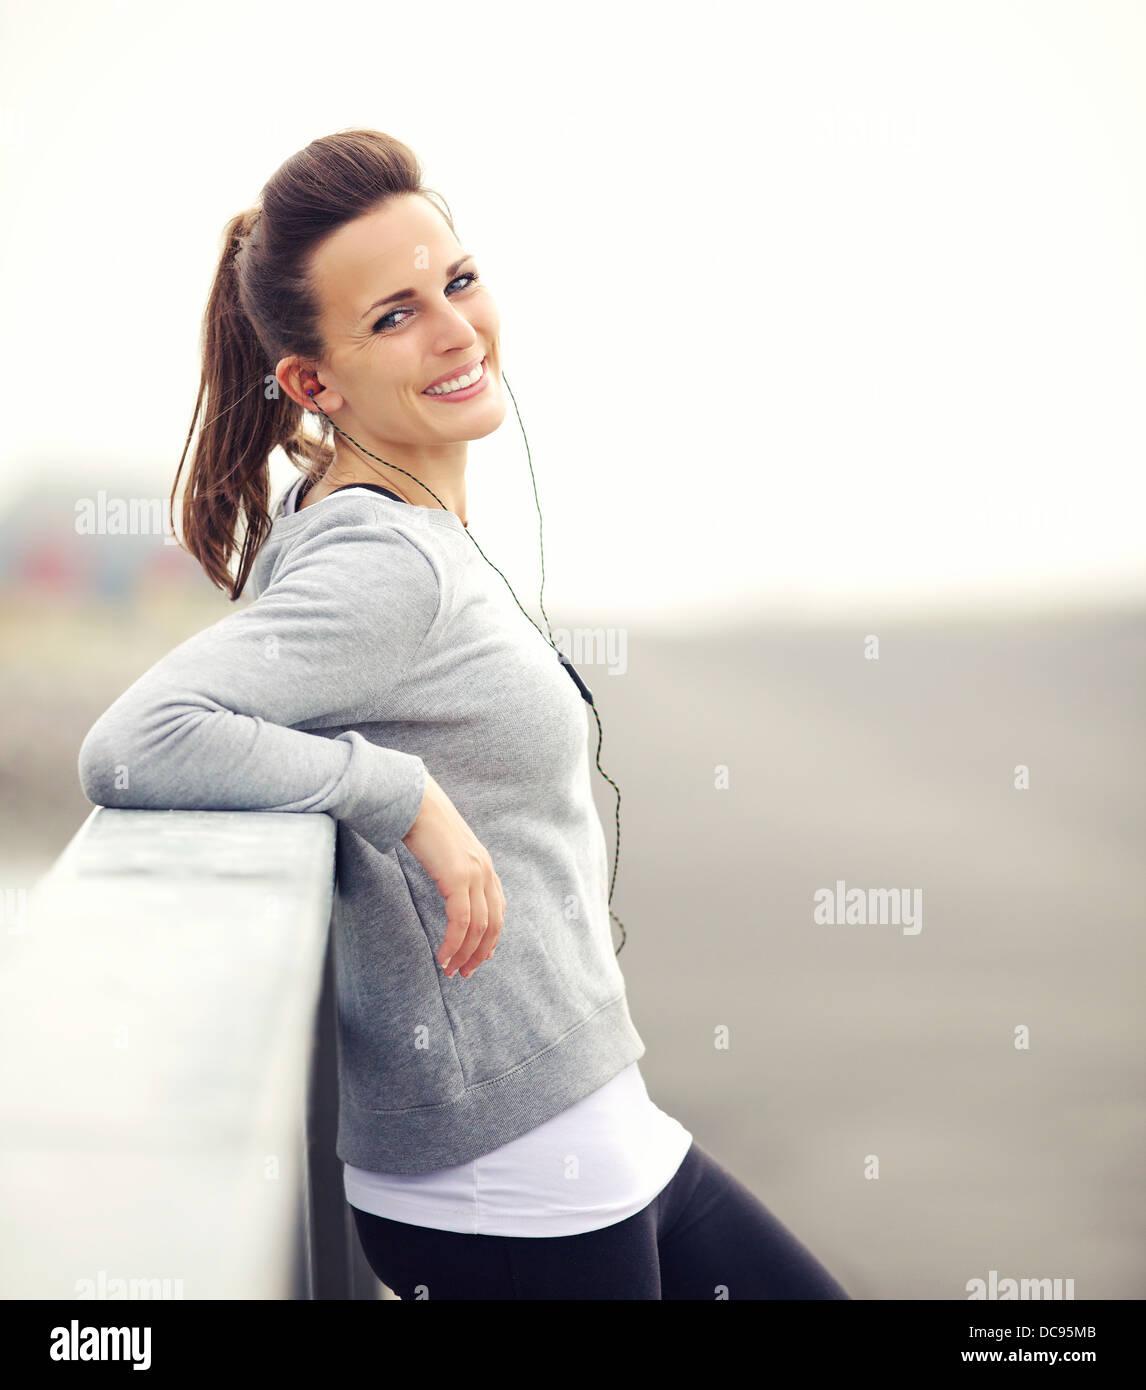 Smiling woman having her break after running - Stock Image